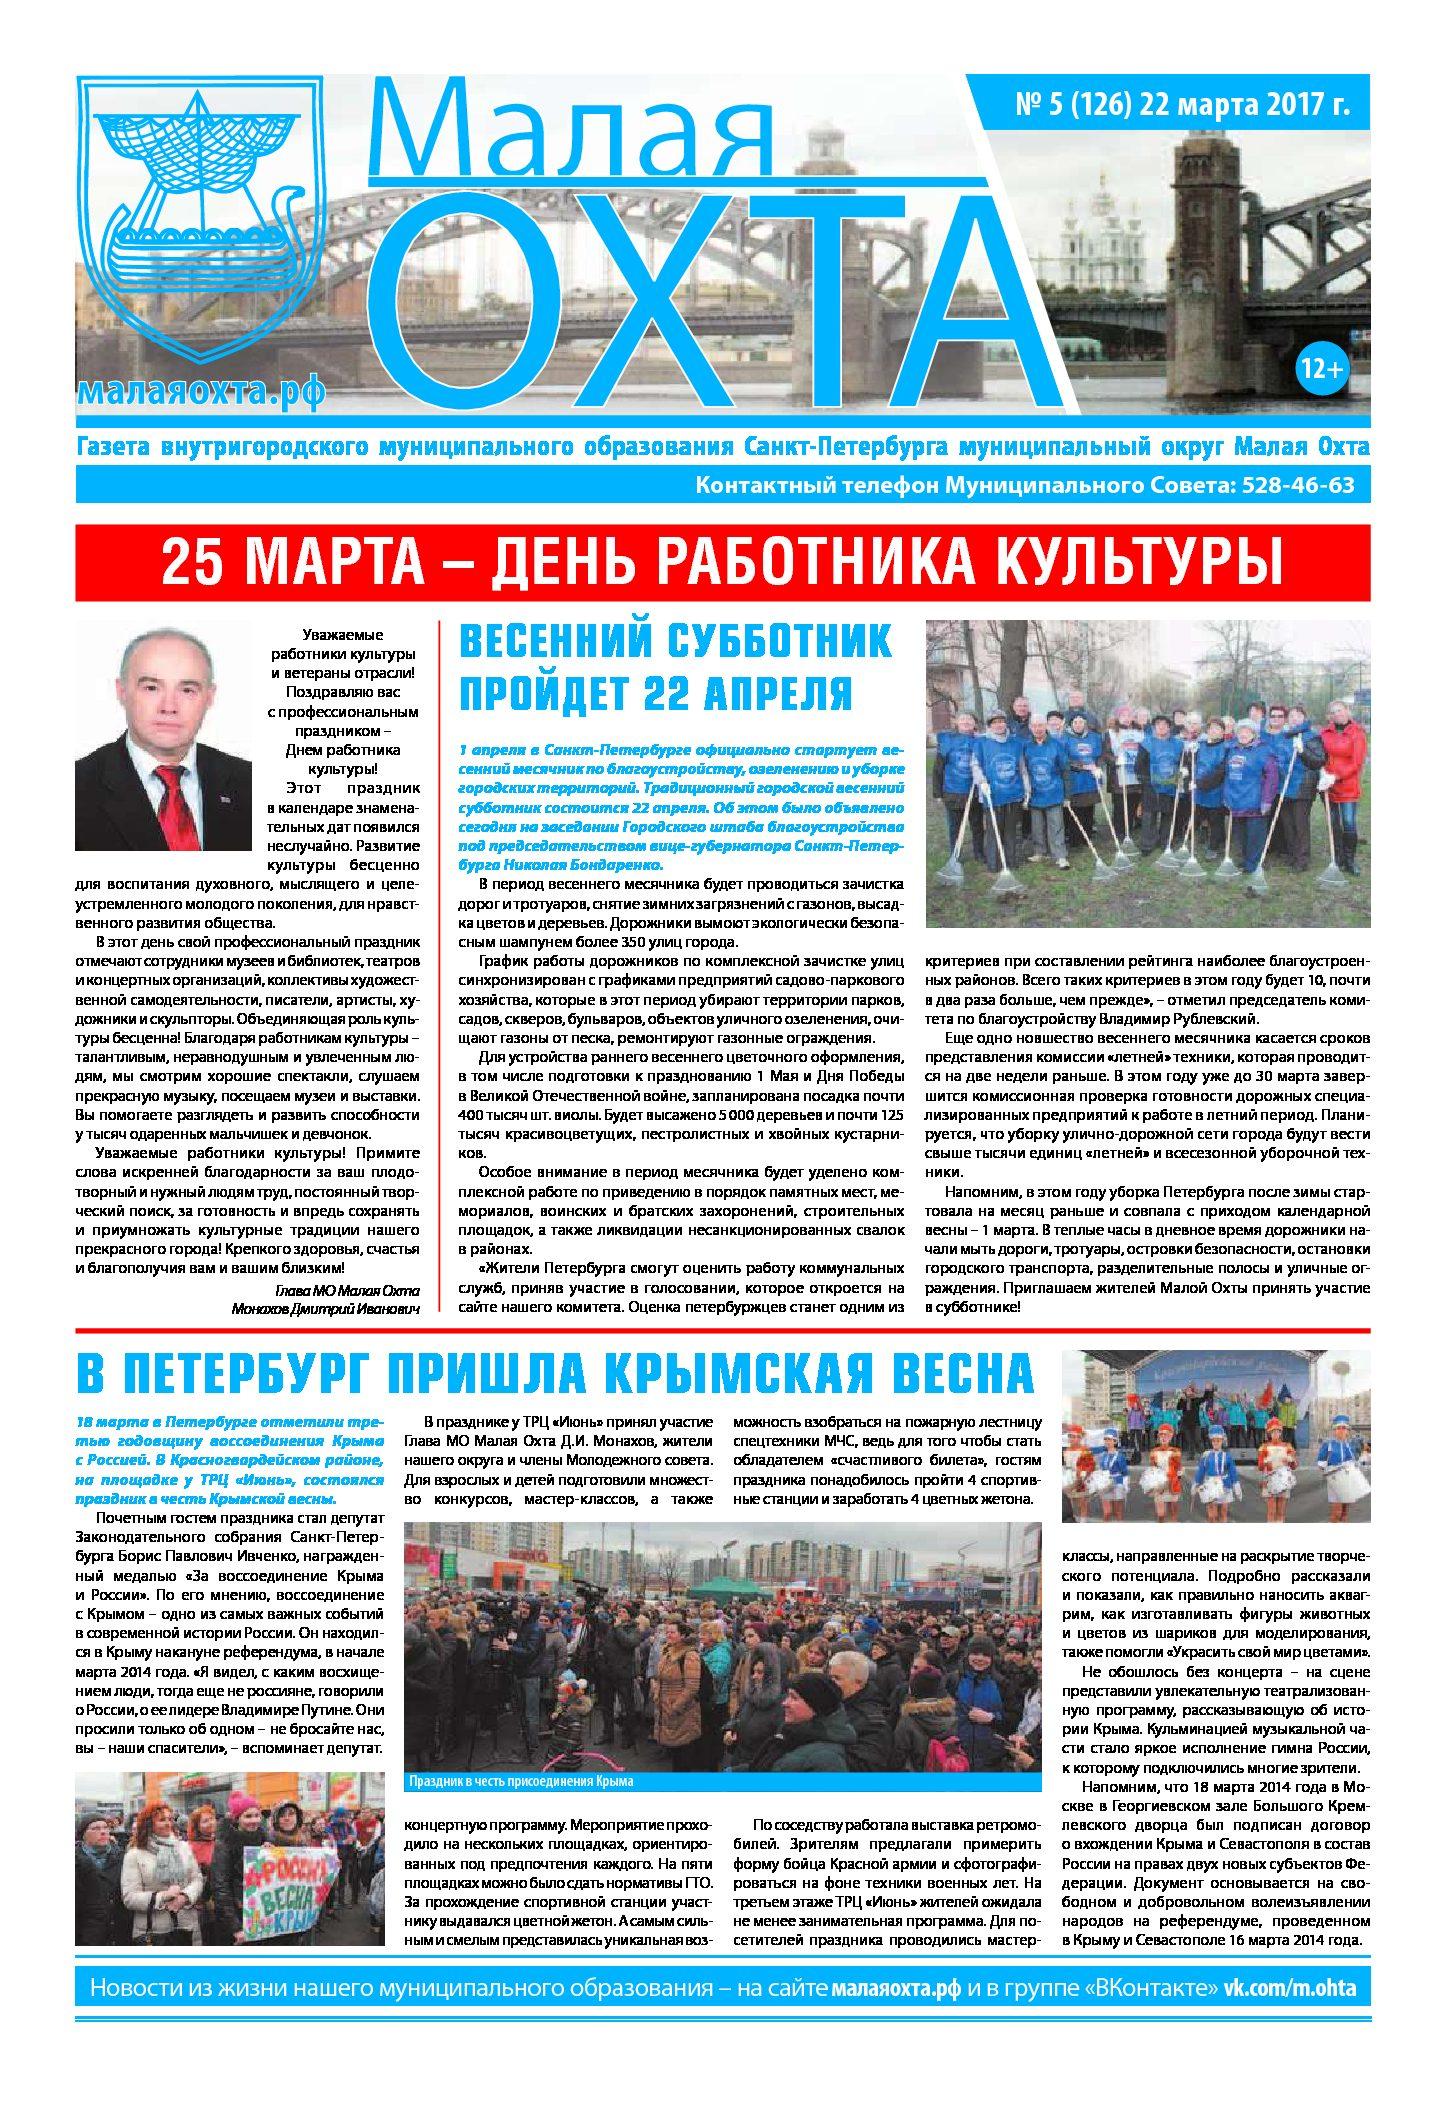 Газета № 05 2017